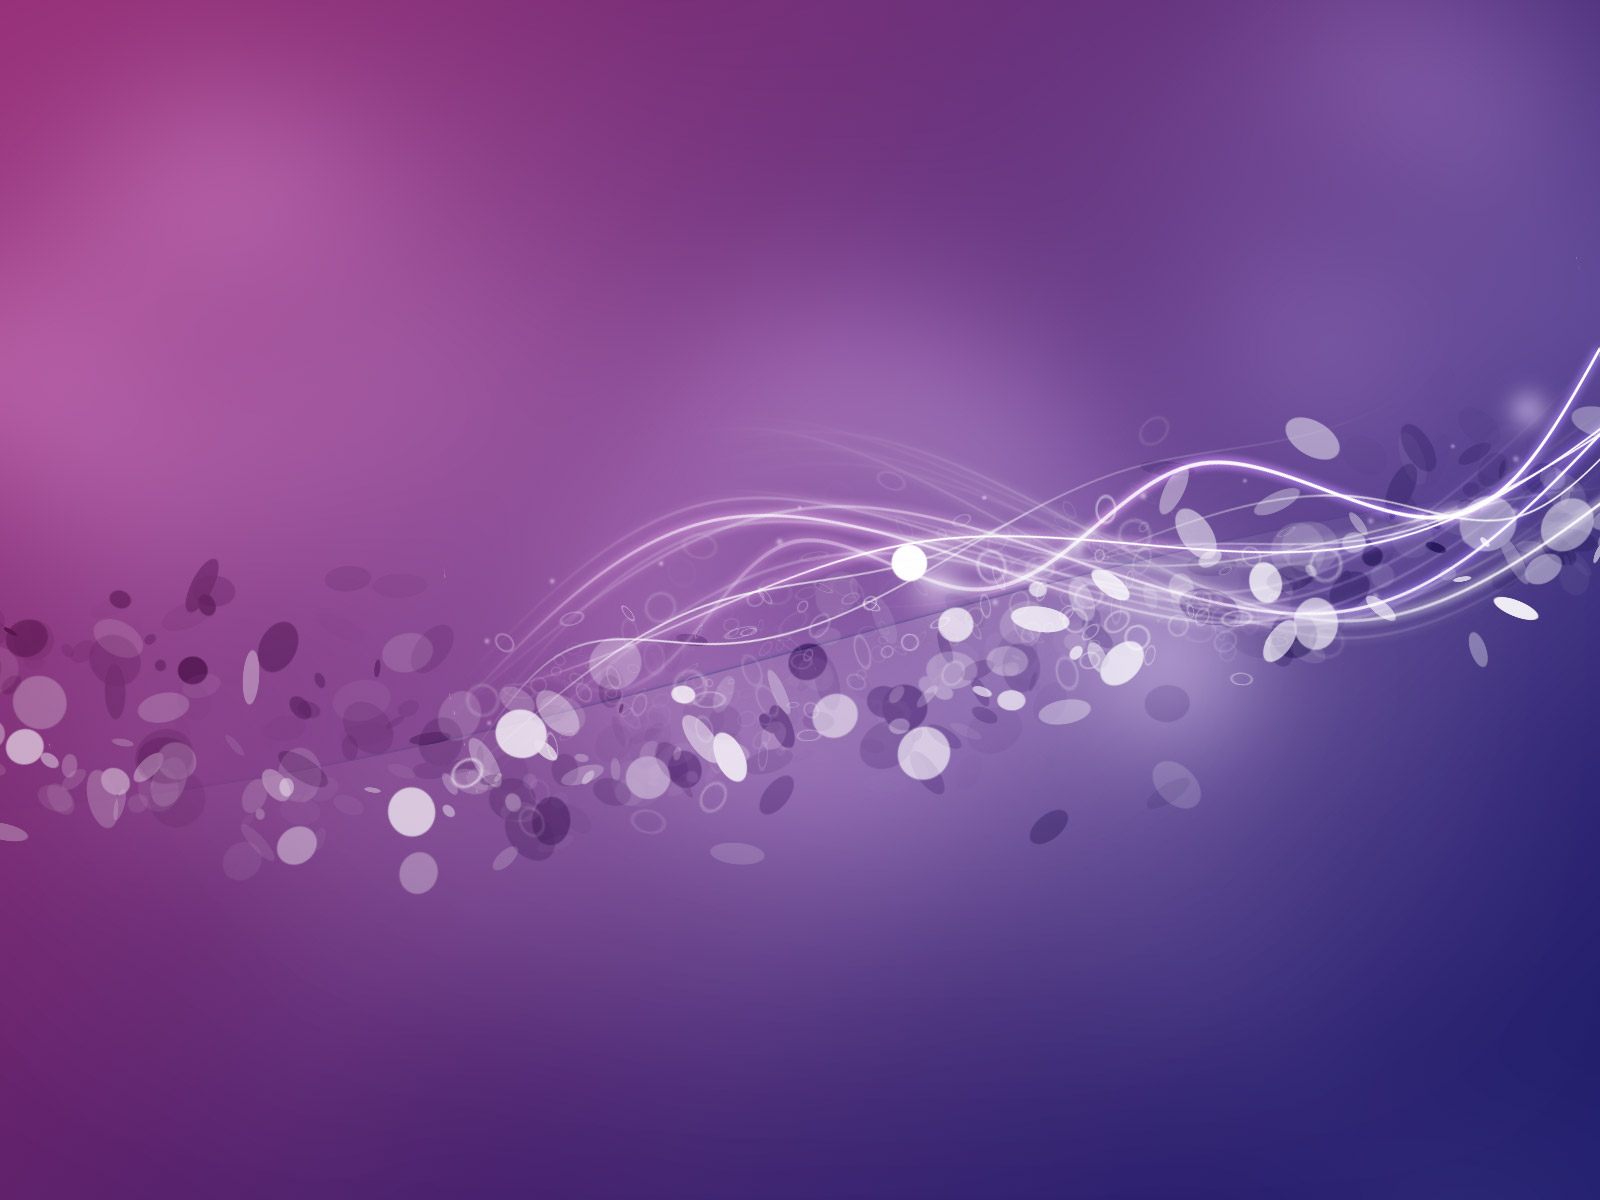 light purple wallpaper hd - photo #21